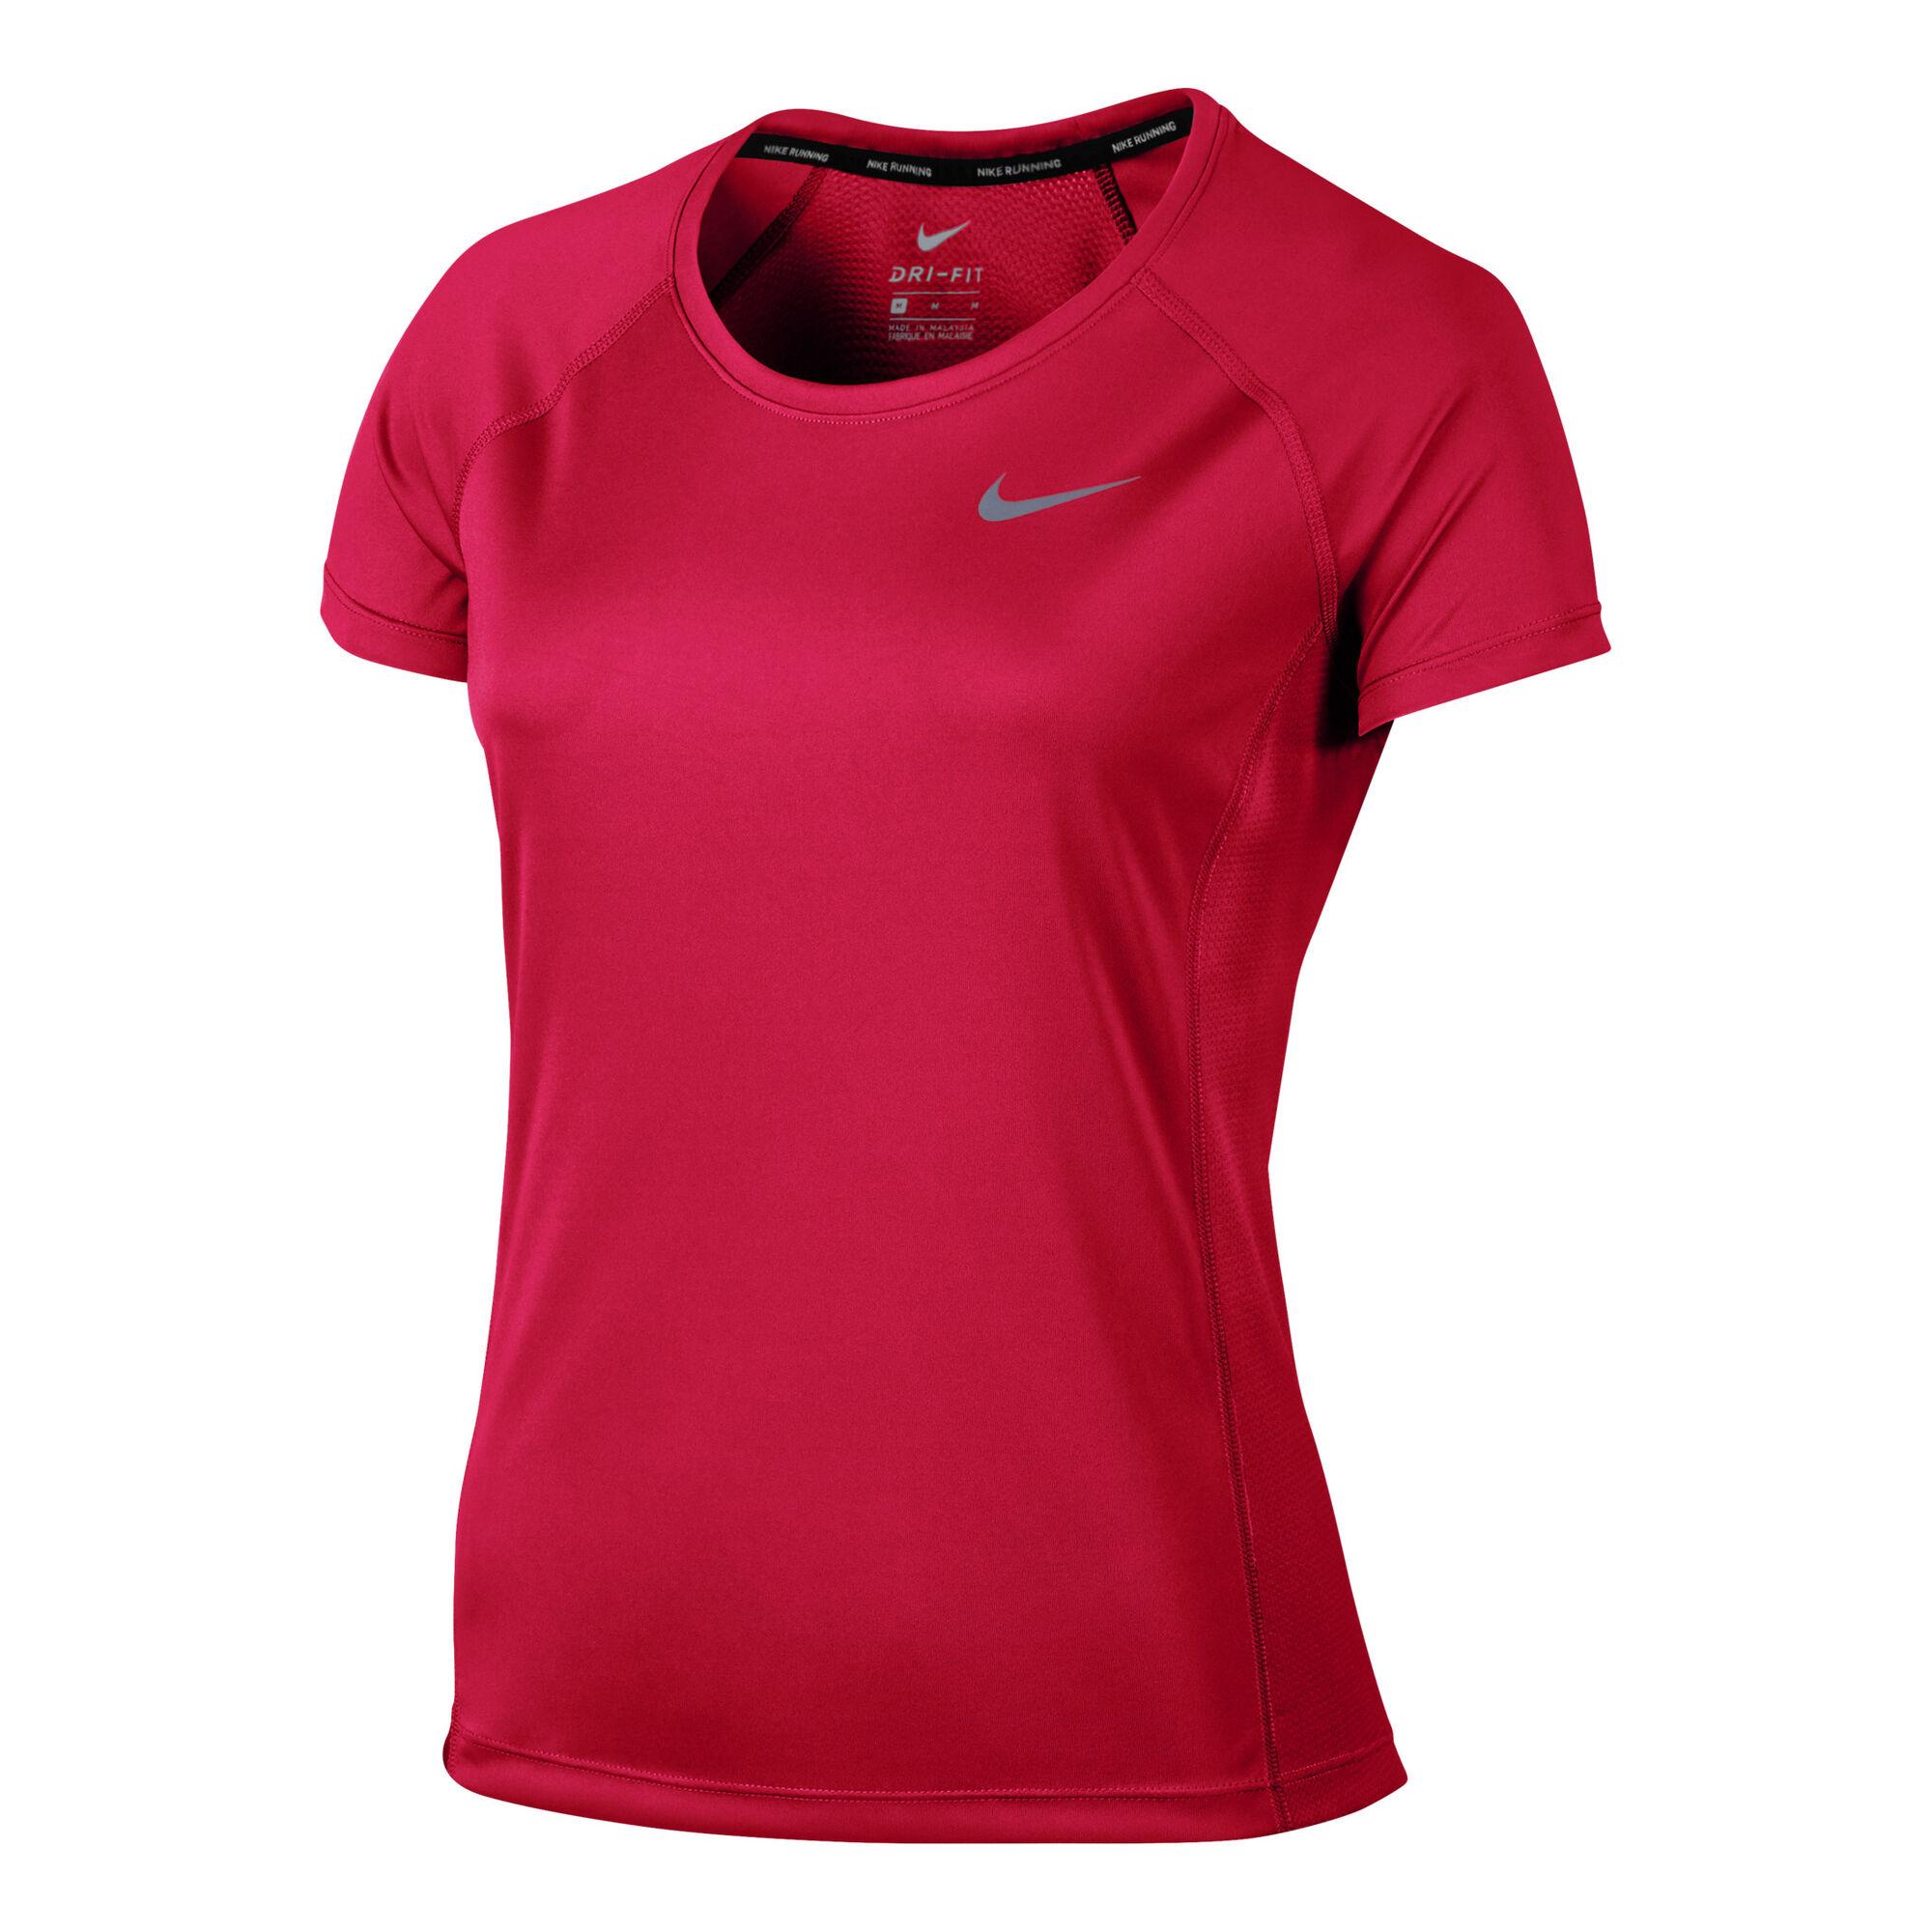 a4d85d57901 buy Nike Dry Miler T-Shirt Women - Pink, Silver online | Jogging-Point